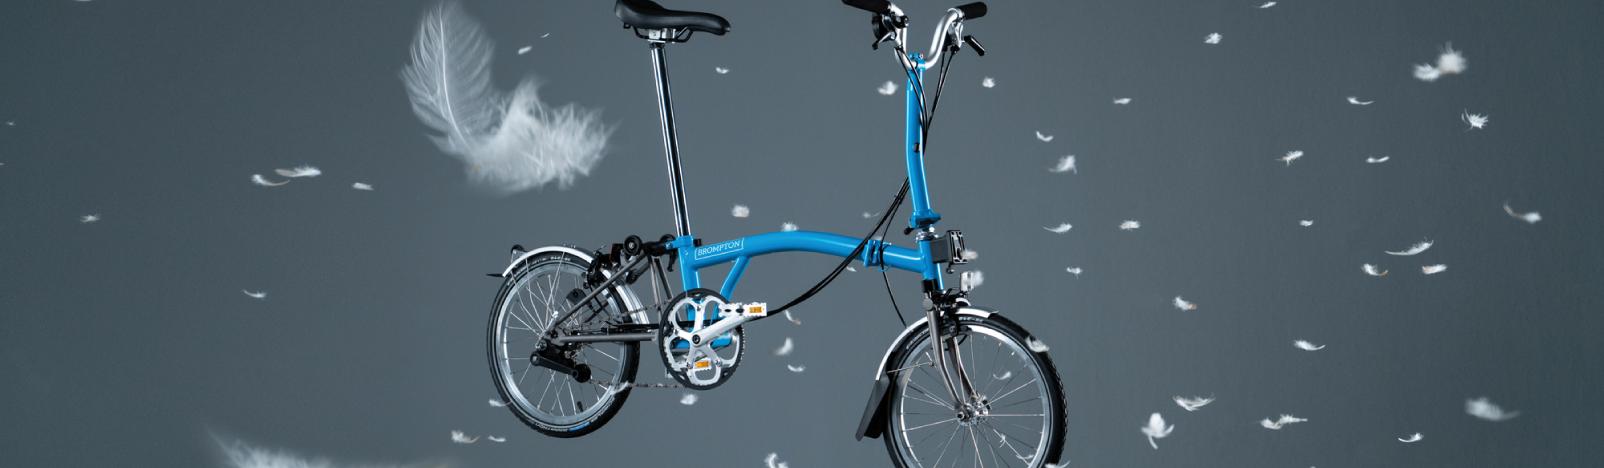 Brompton Superlight folding bike